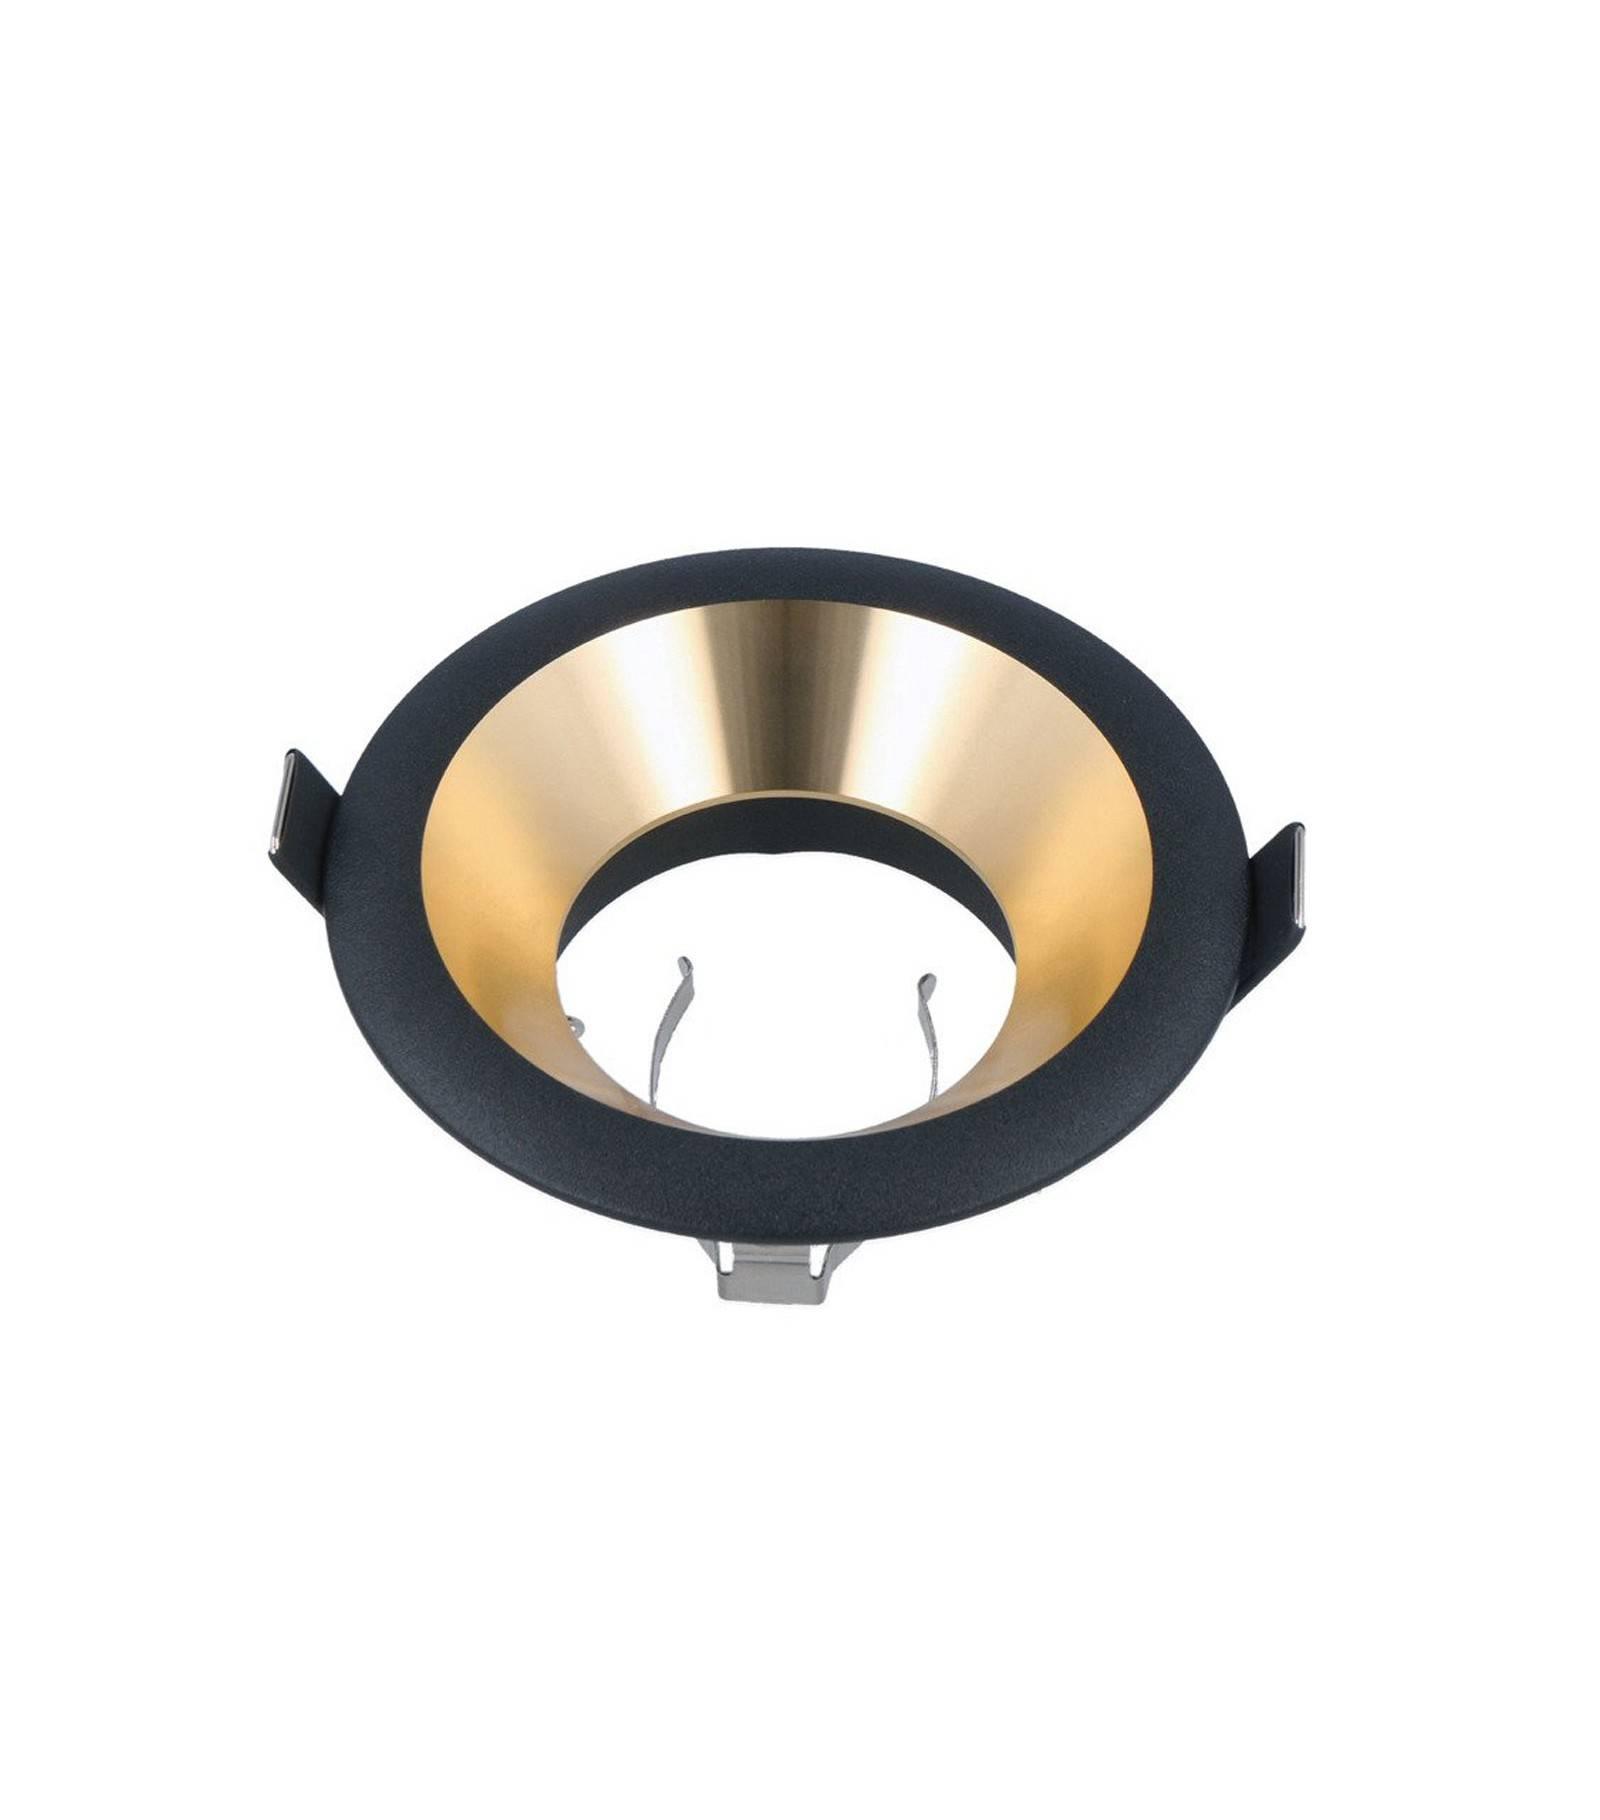 spot encastrable otlika fixe aluminium noir et or sable ledline 241321